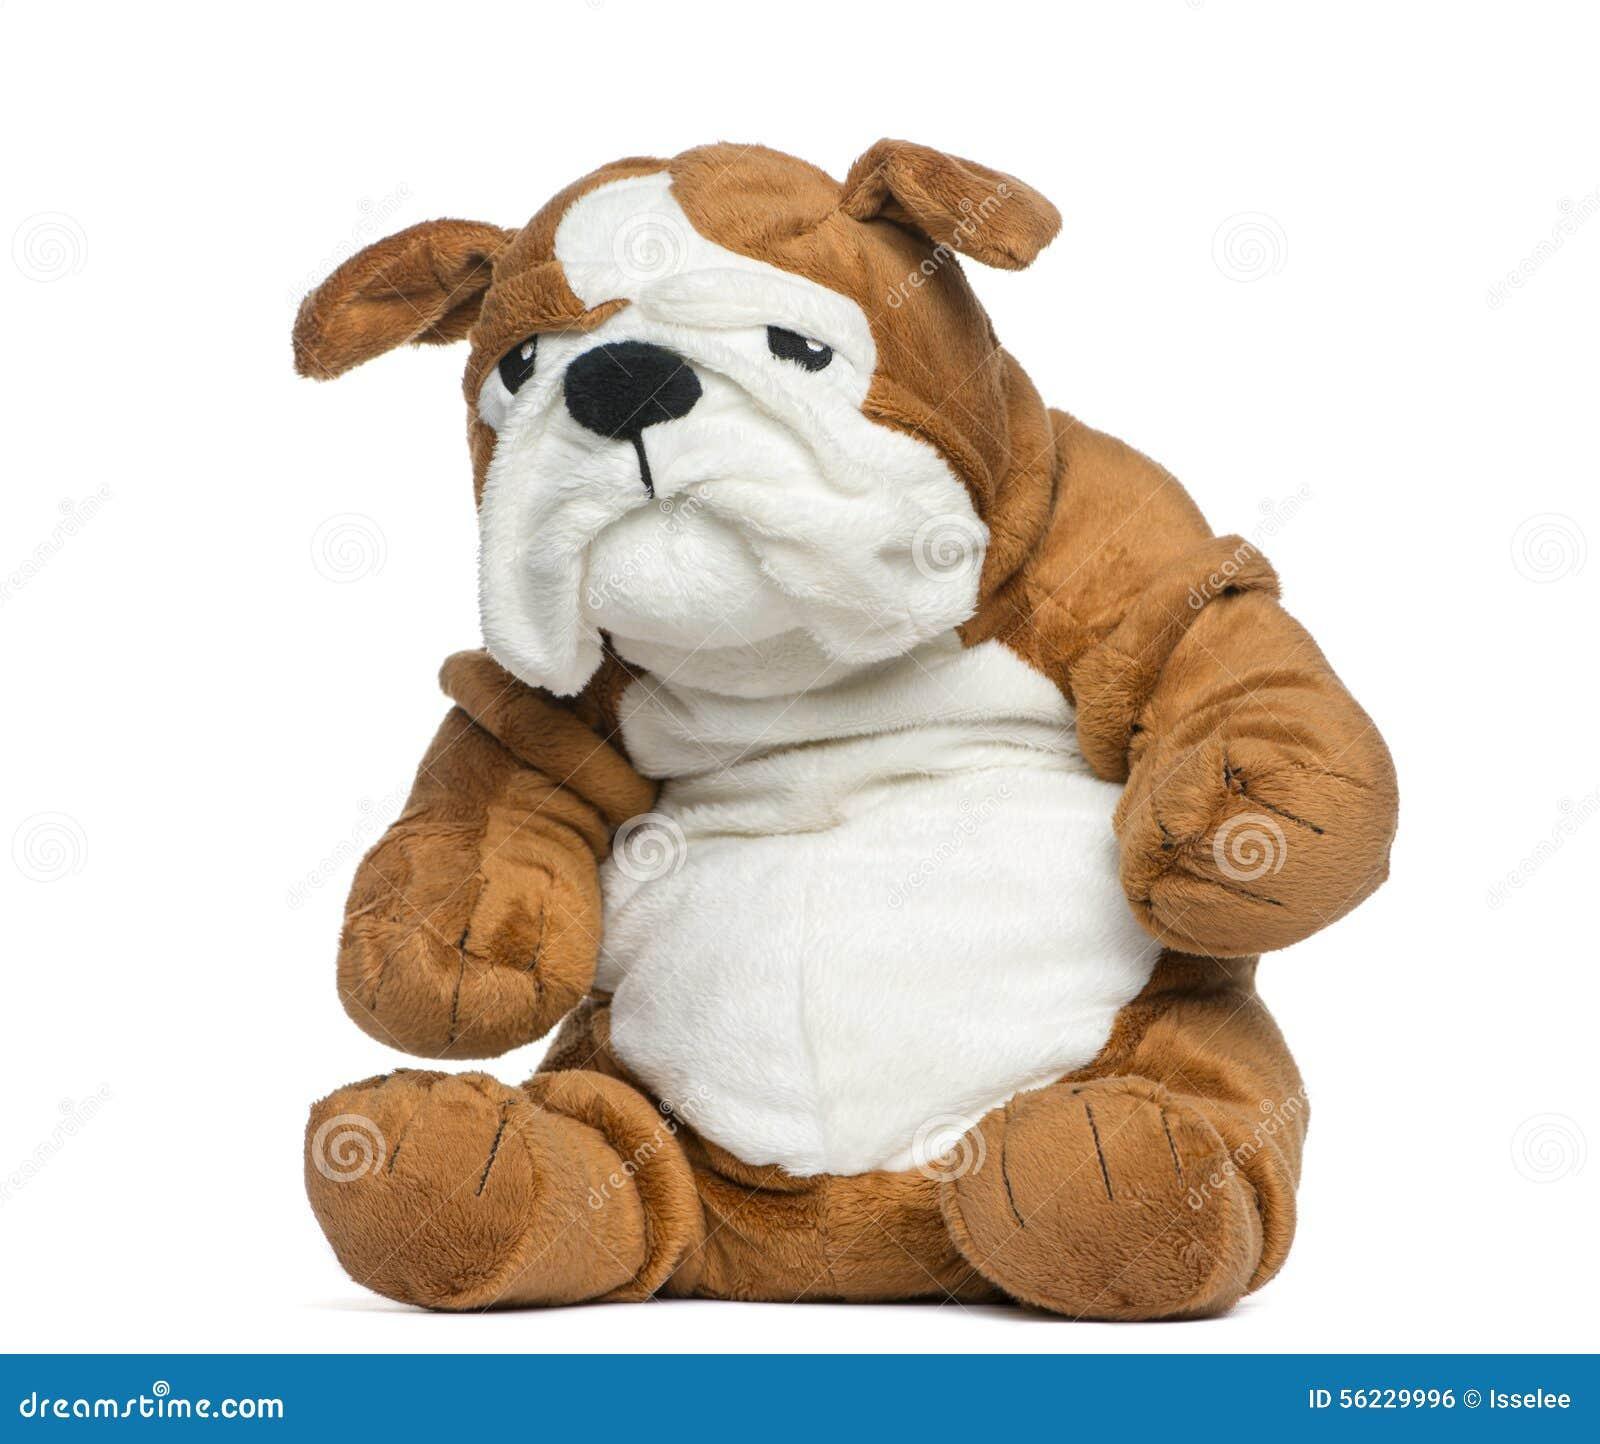 Stuffed English Bulldog Toy Stock Photo Image Of Animal Studio